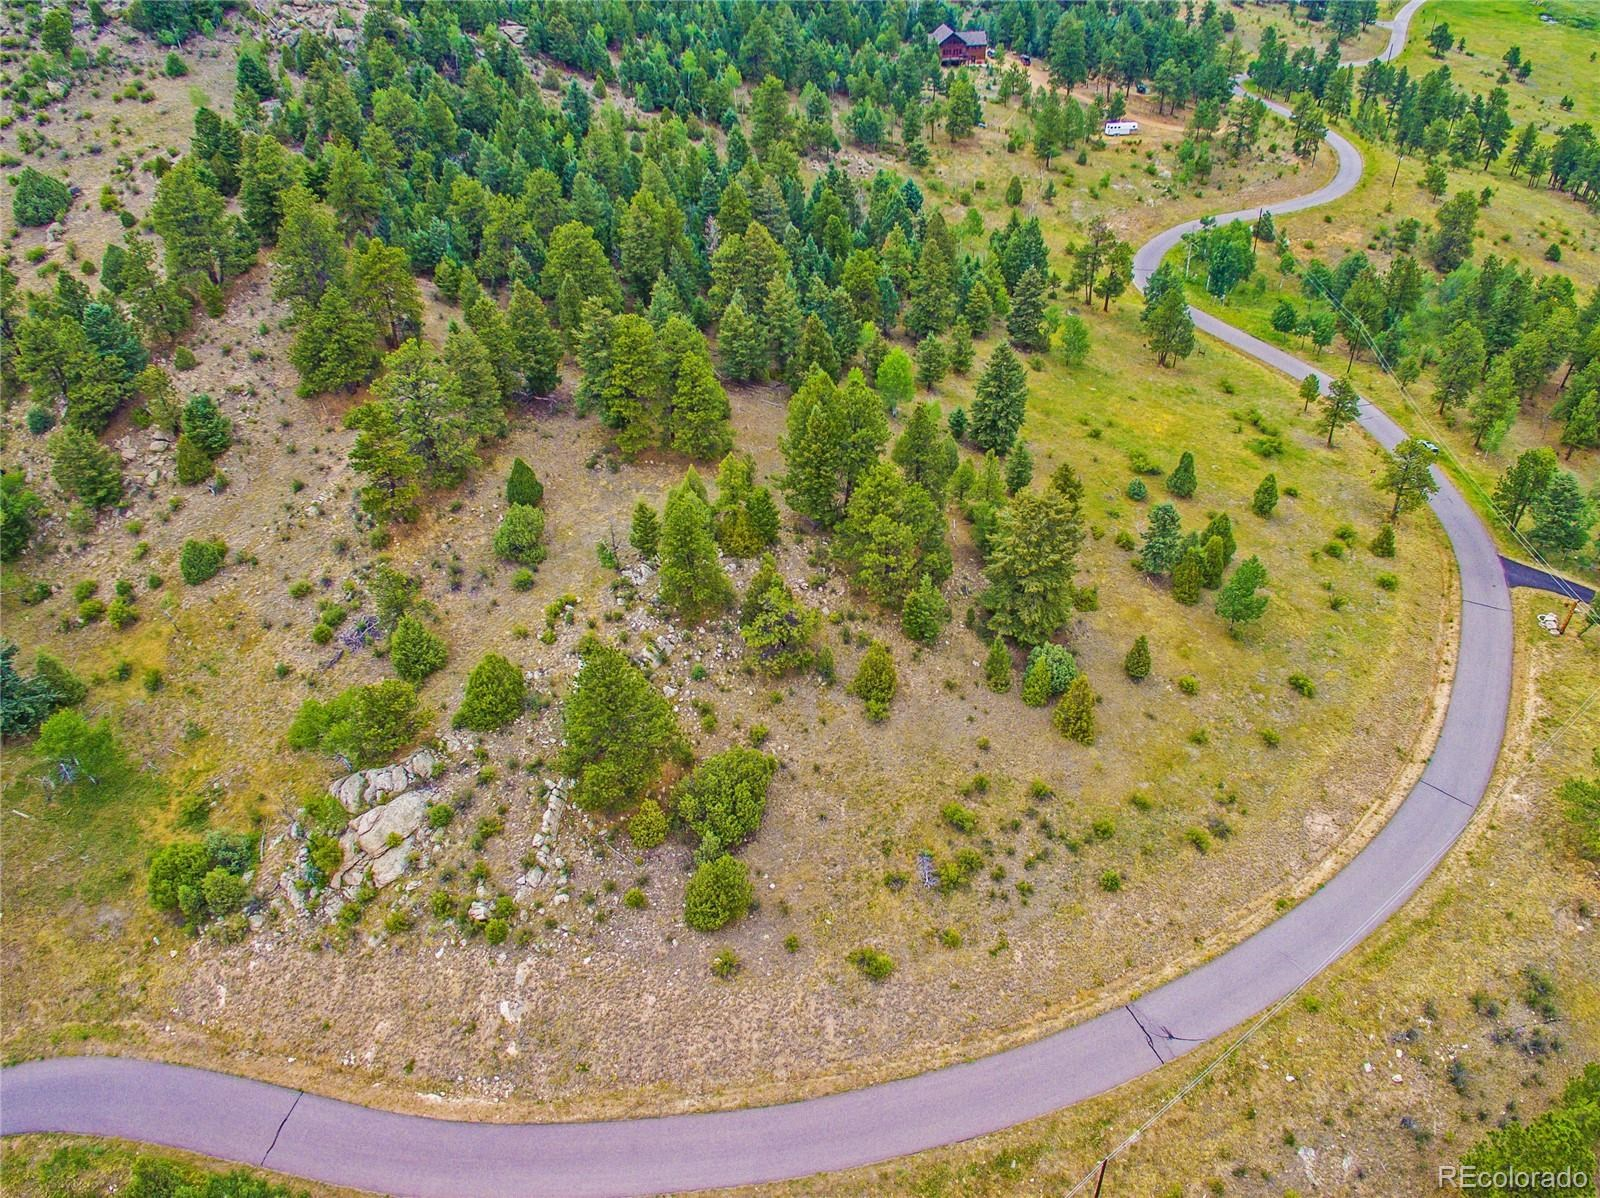 MLS# 3136640 - 9 - 14515 Reserve Road, Pine, CO 80470